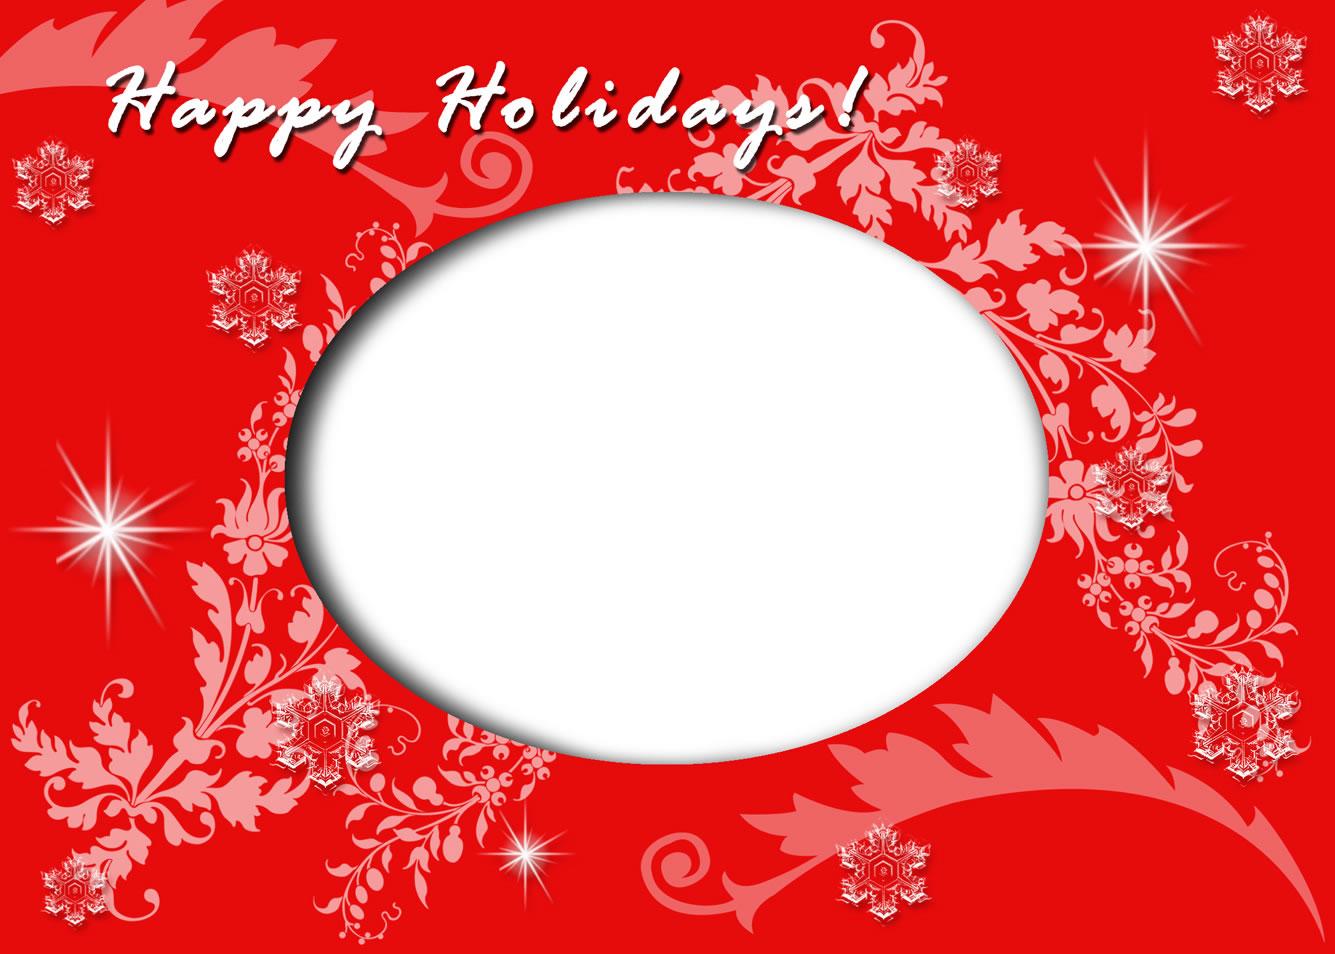 Holiday card template solarfm m4hsunfo